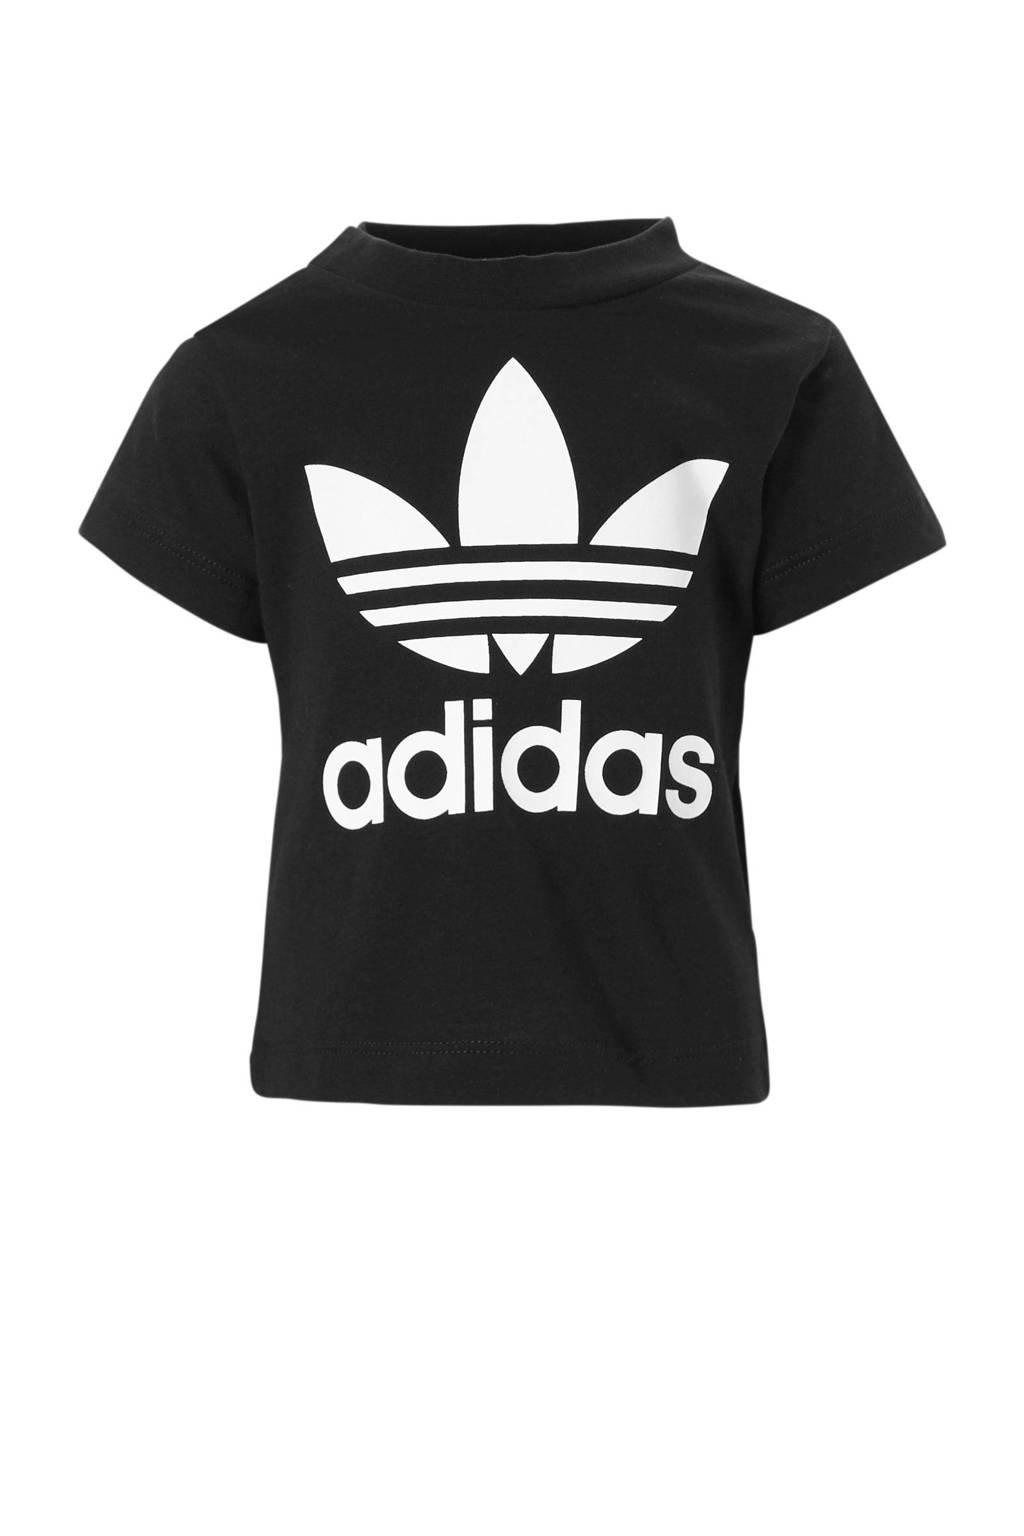 adidas originals Adicolor T-shirt zwart, Zwart/wit